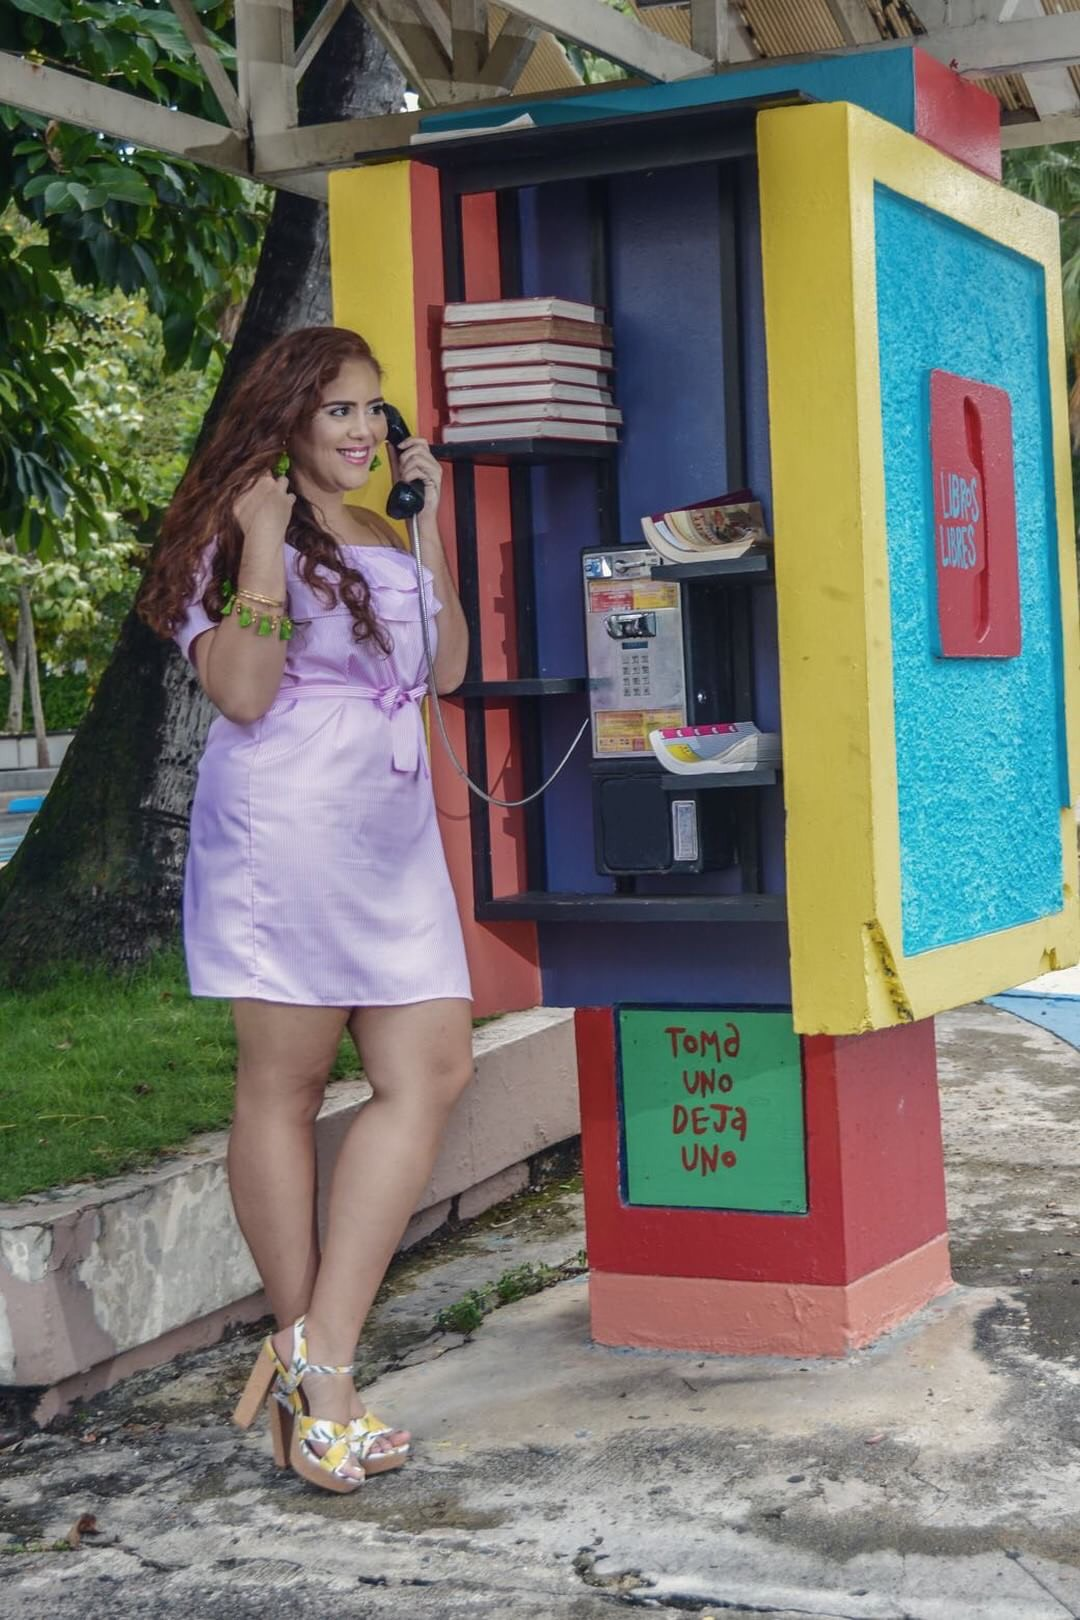 Pink Off Shoulder Striped Ruffle Dress ,  Lemon Heels (Hectik by Natalia @ La Defensa)  *Contains Affiliate Links*